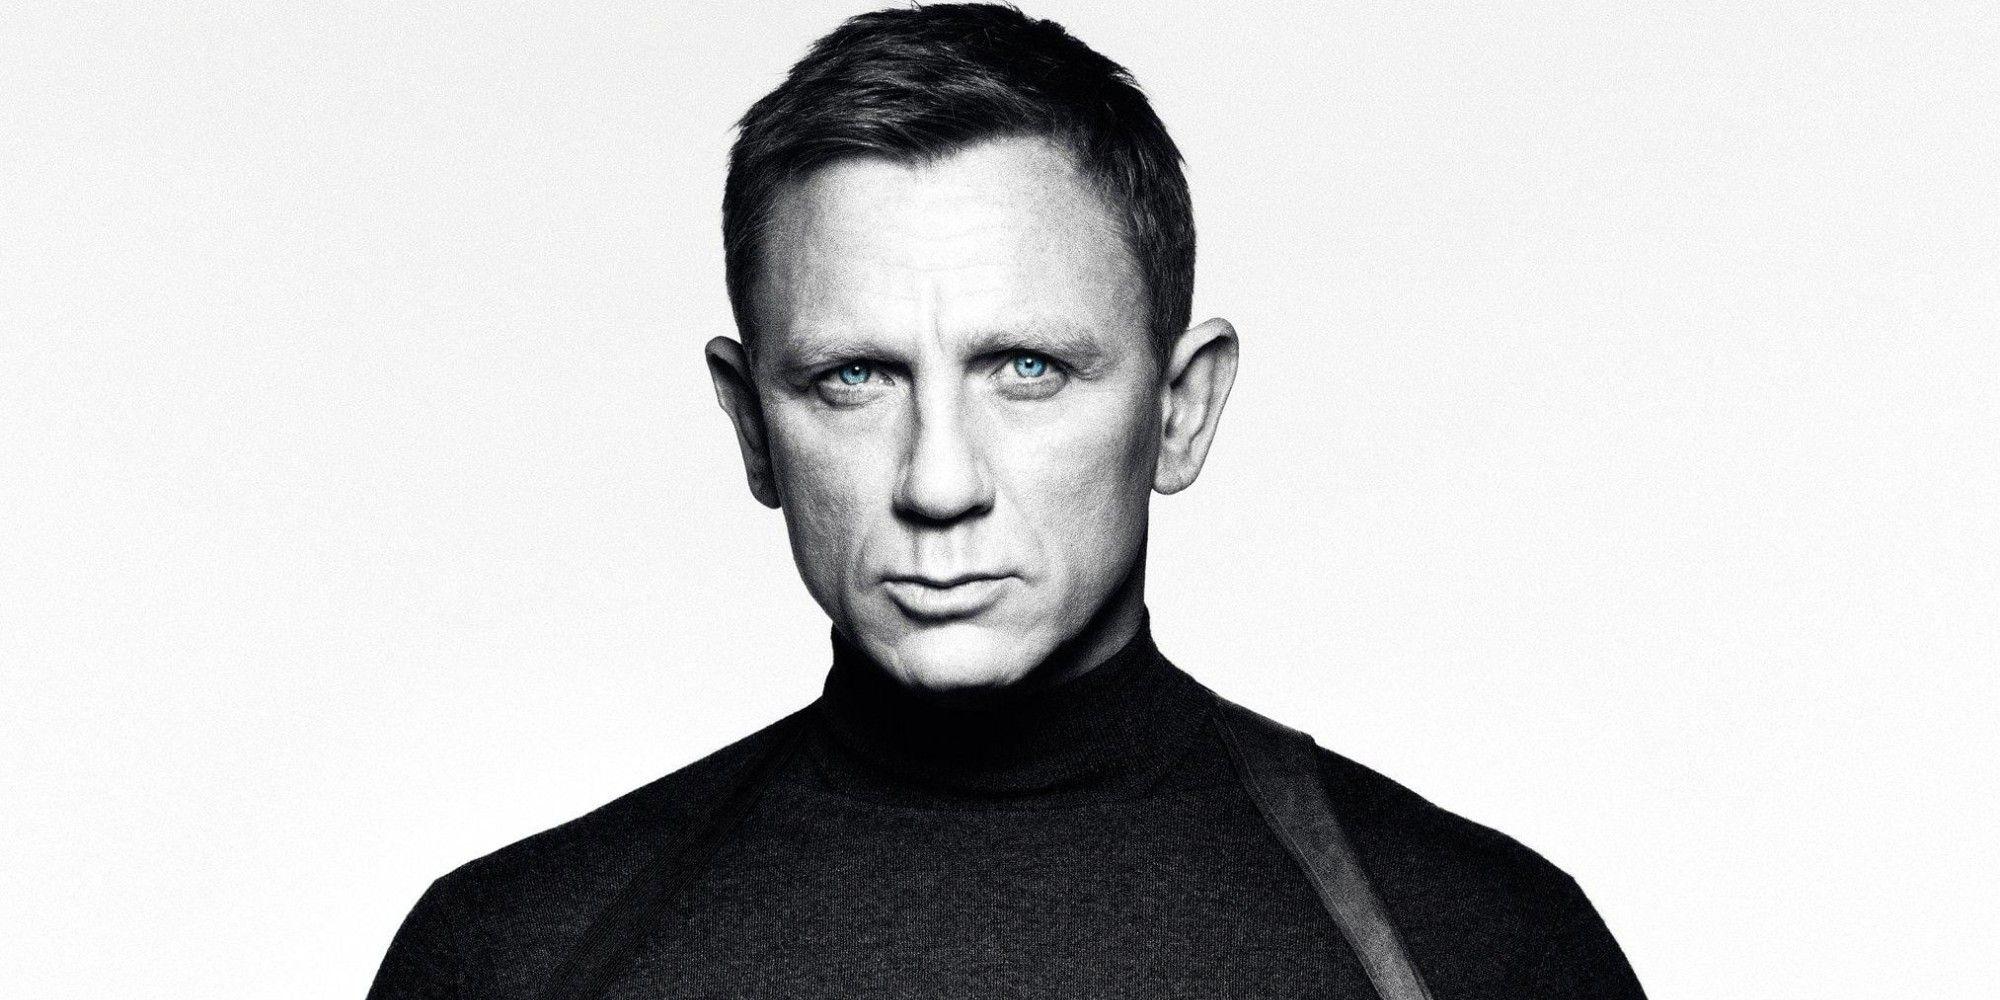 Daniel Craig Confirms James Bond 25 Is His Last 007 Movie